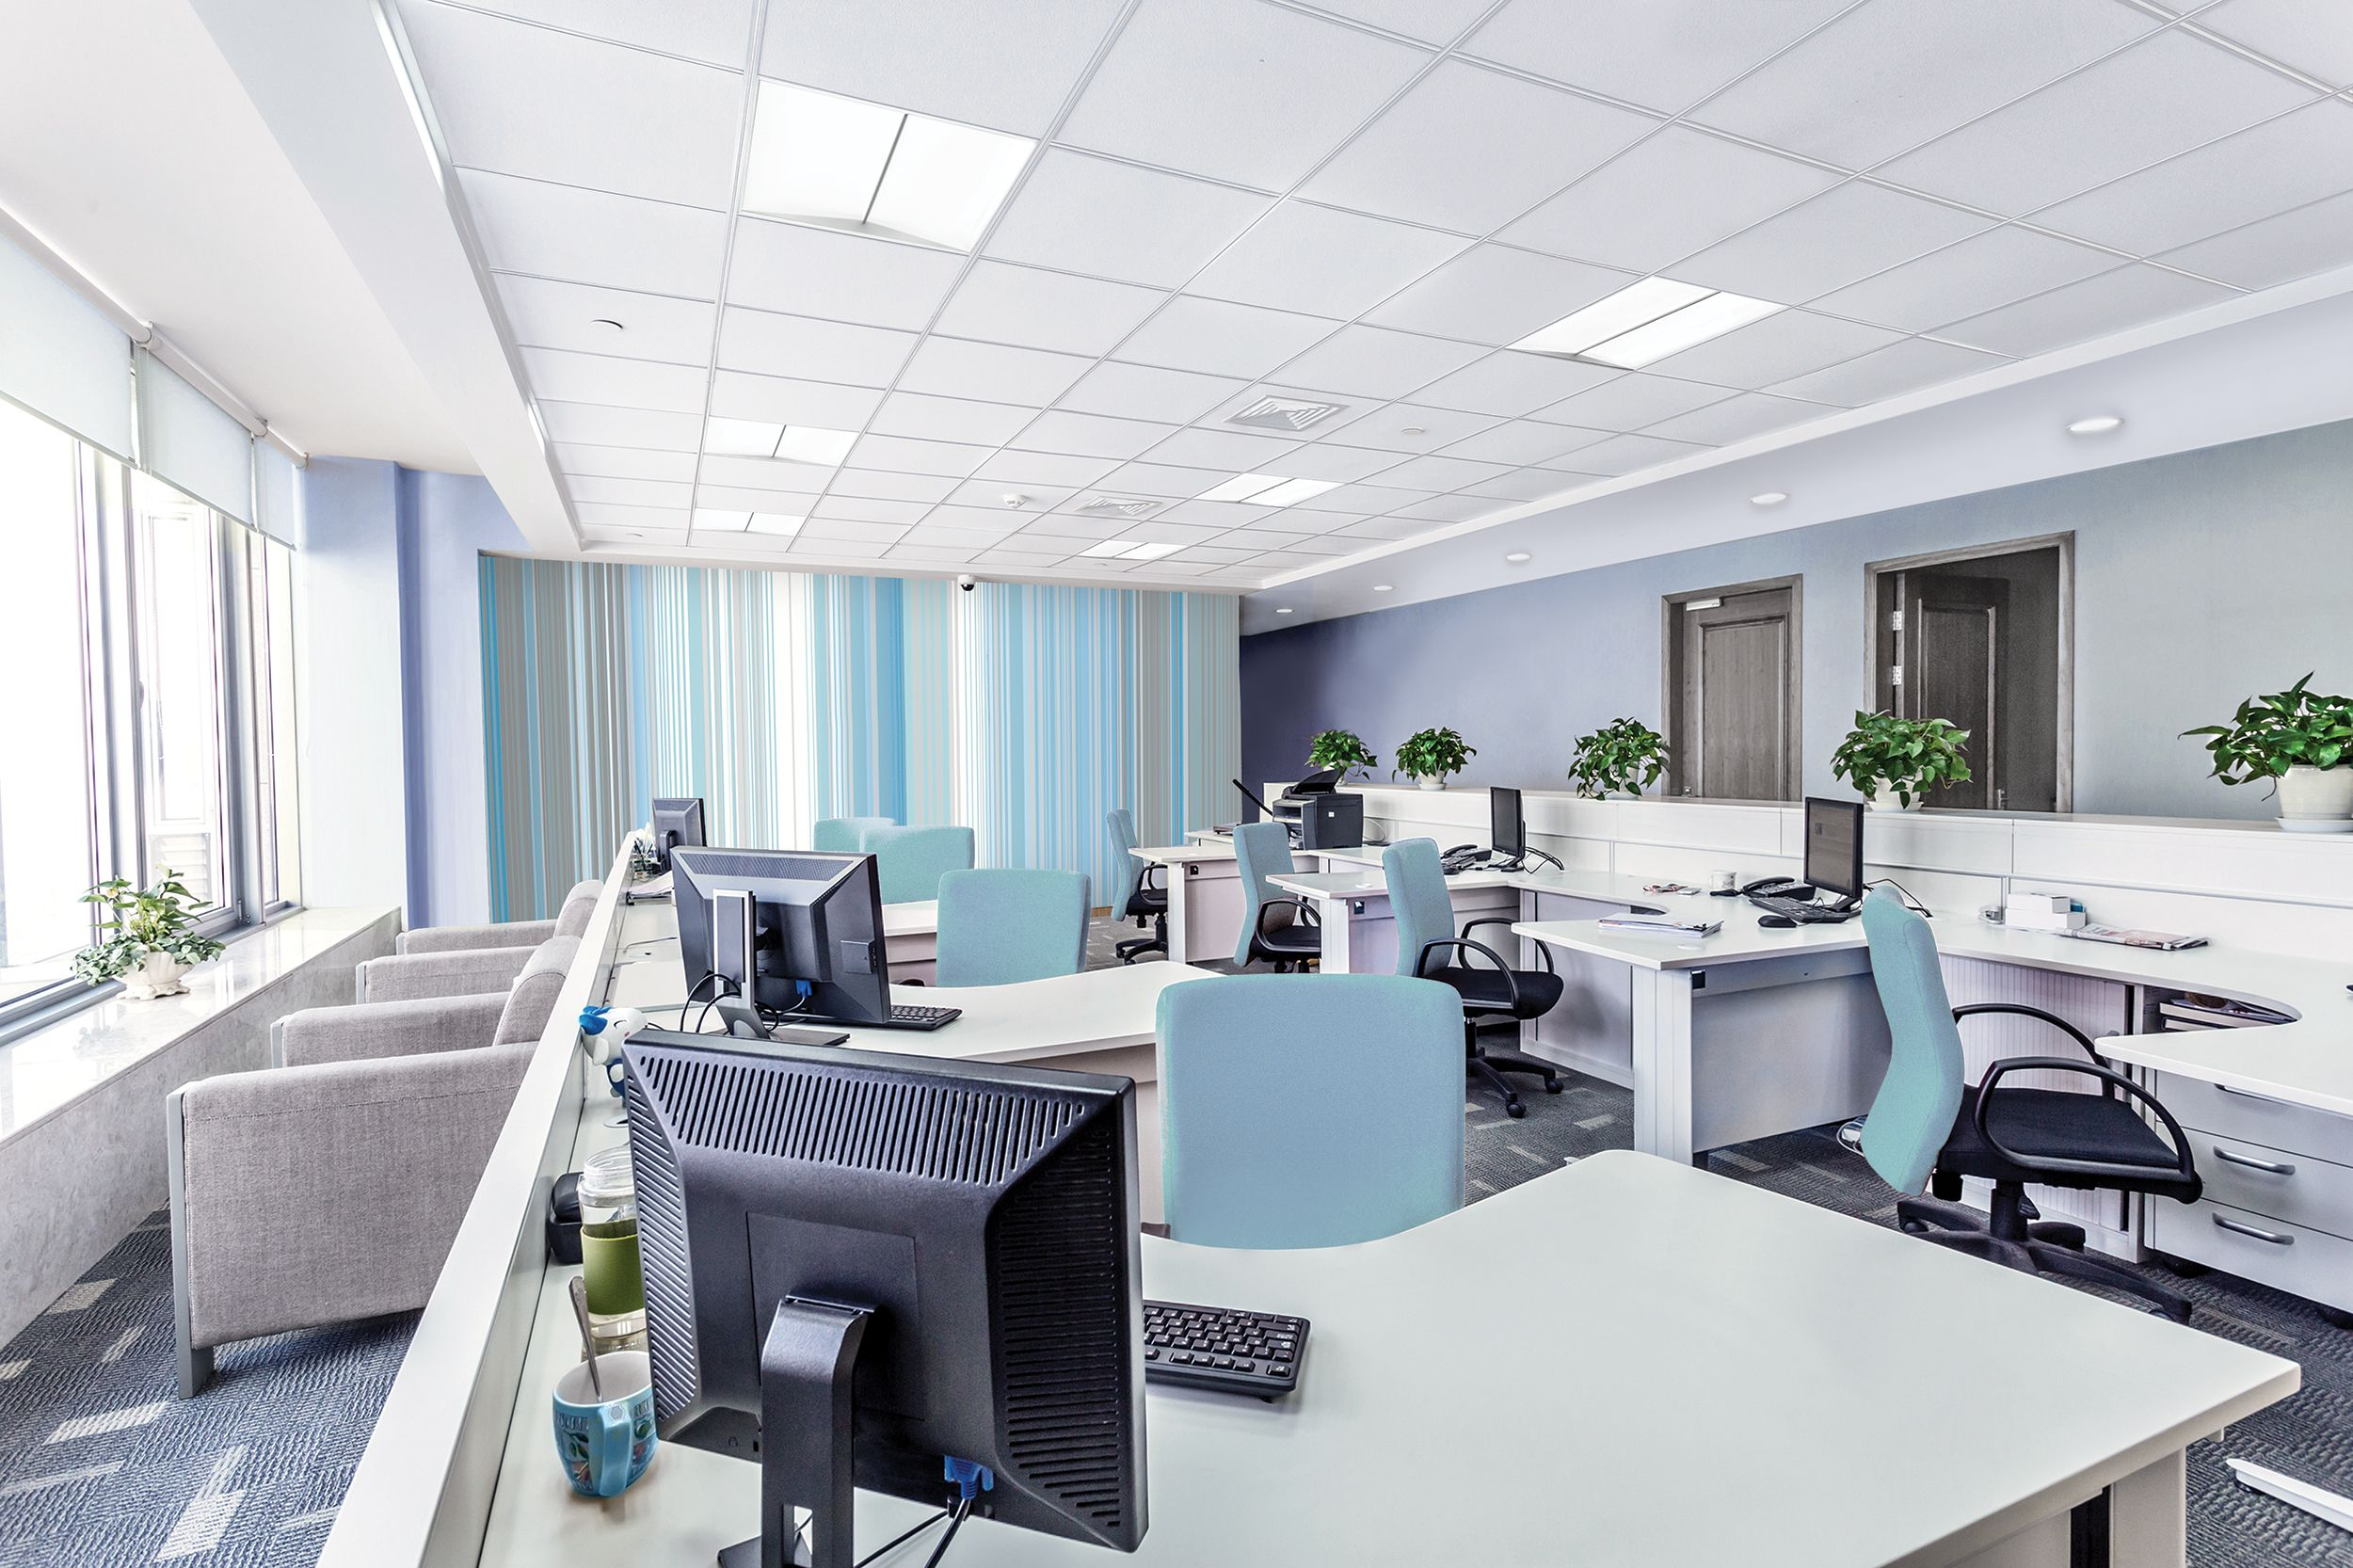 Discreet, comfortable lighting with great performance - Philips Ledalite SilkSpace LED #EnhanceYourSpaceContest #PhilipsSilkSpace #LowGlare